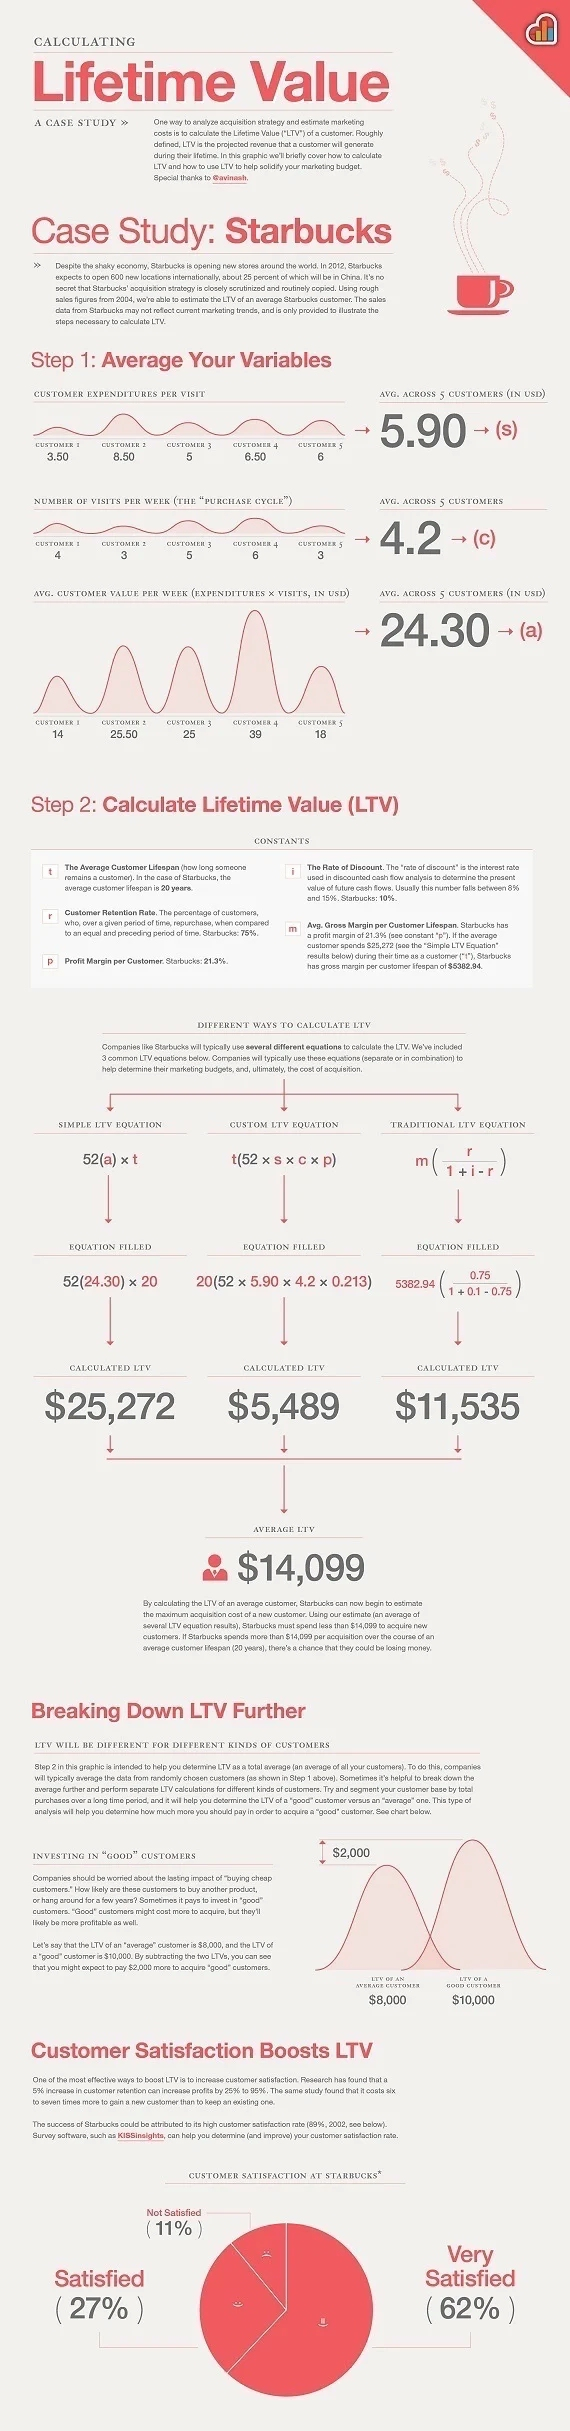 Infographic: Customer Lifetime Value